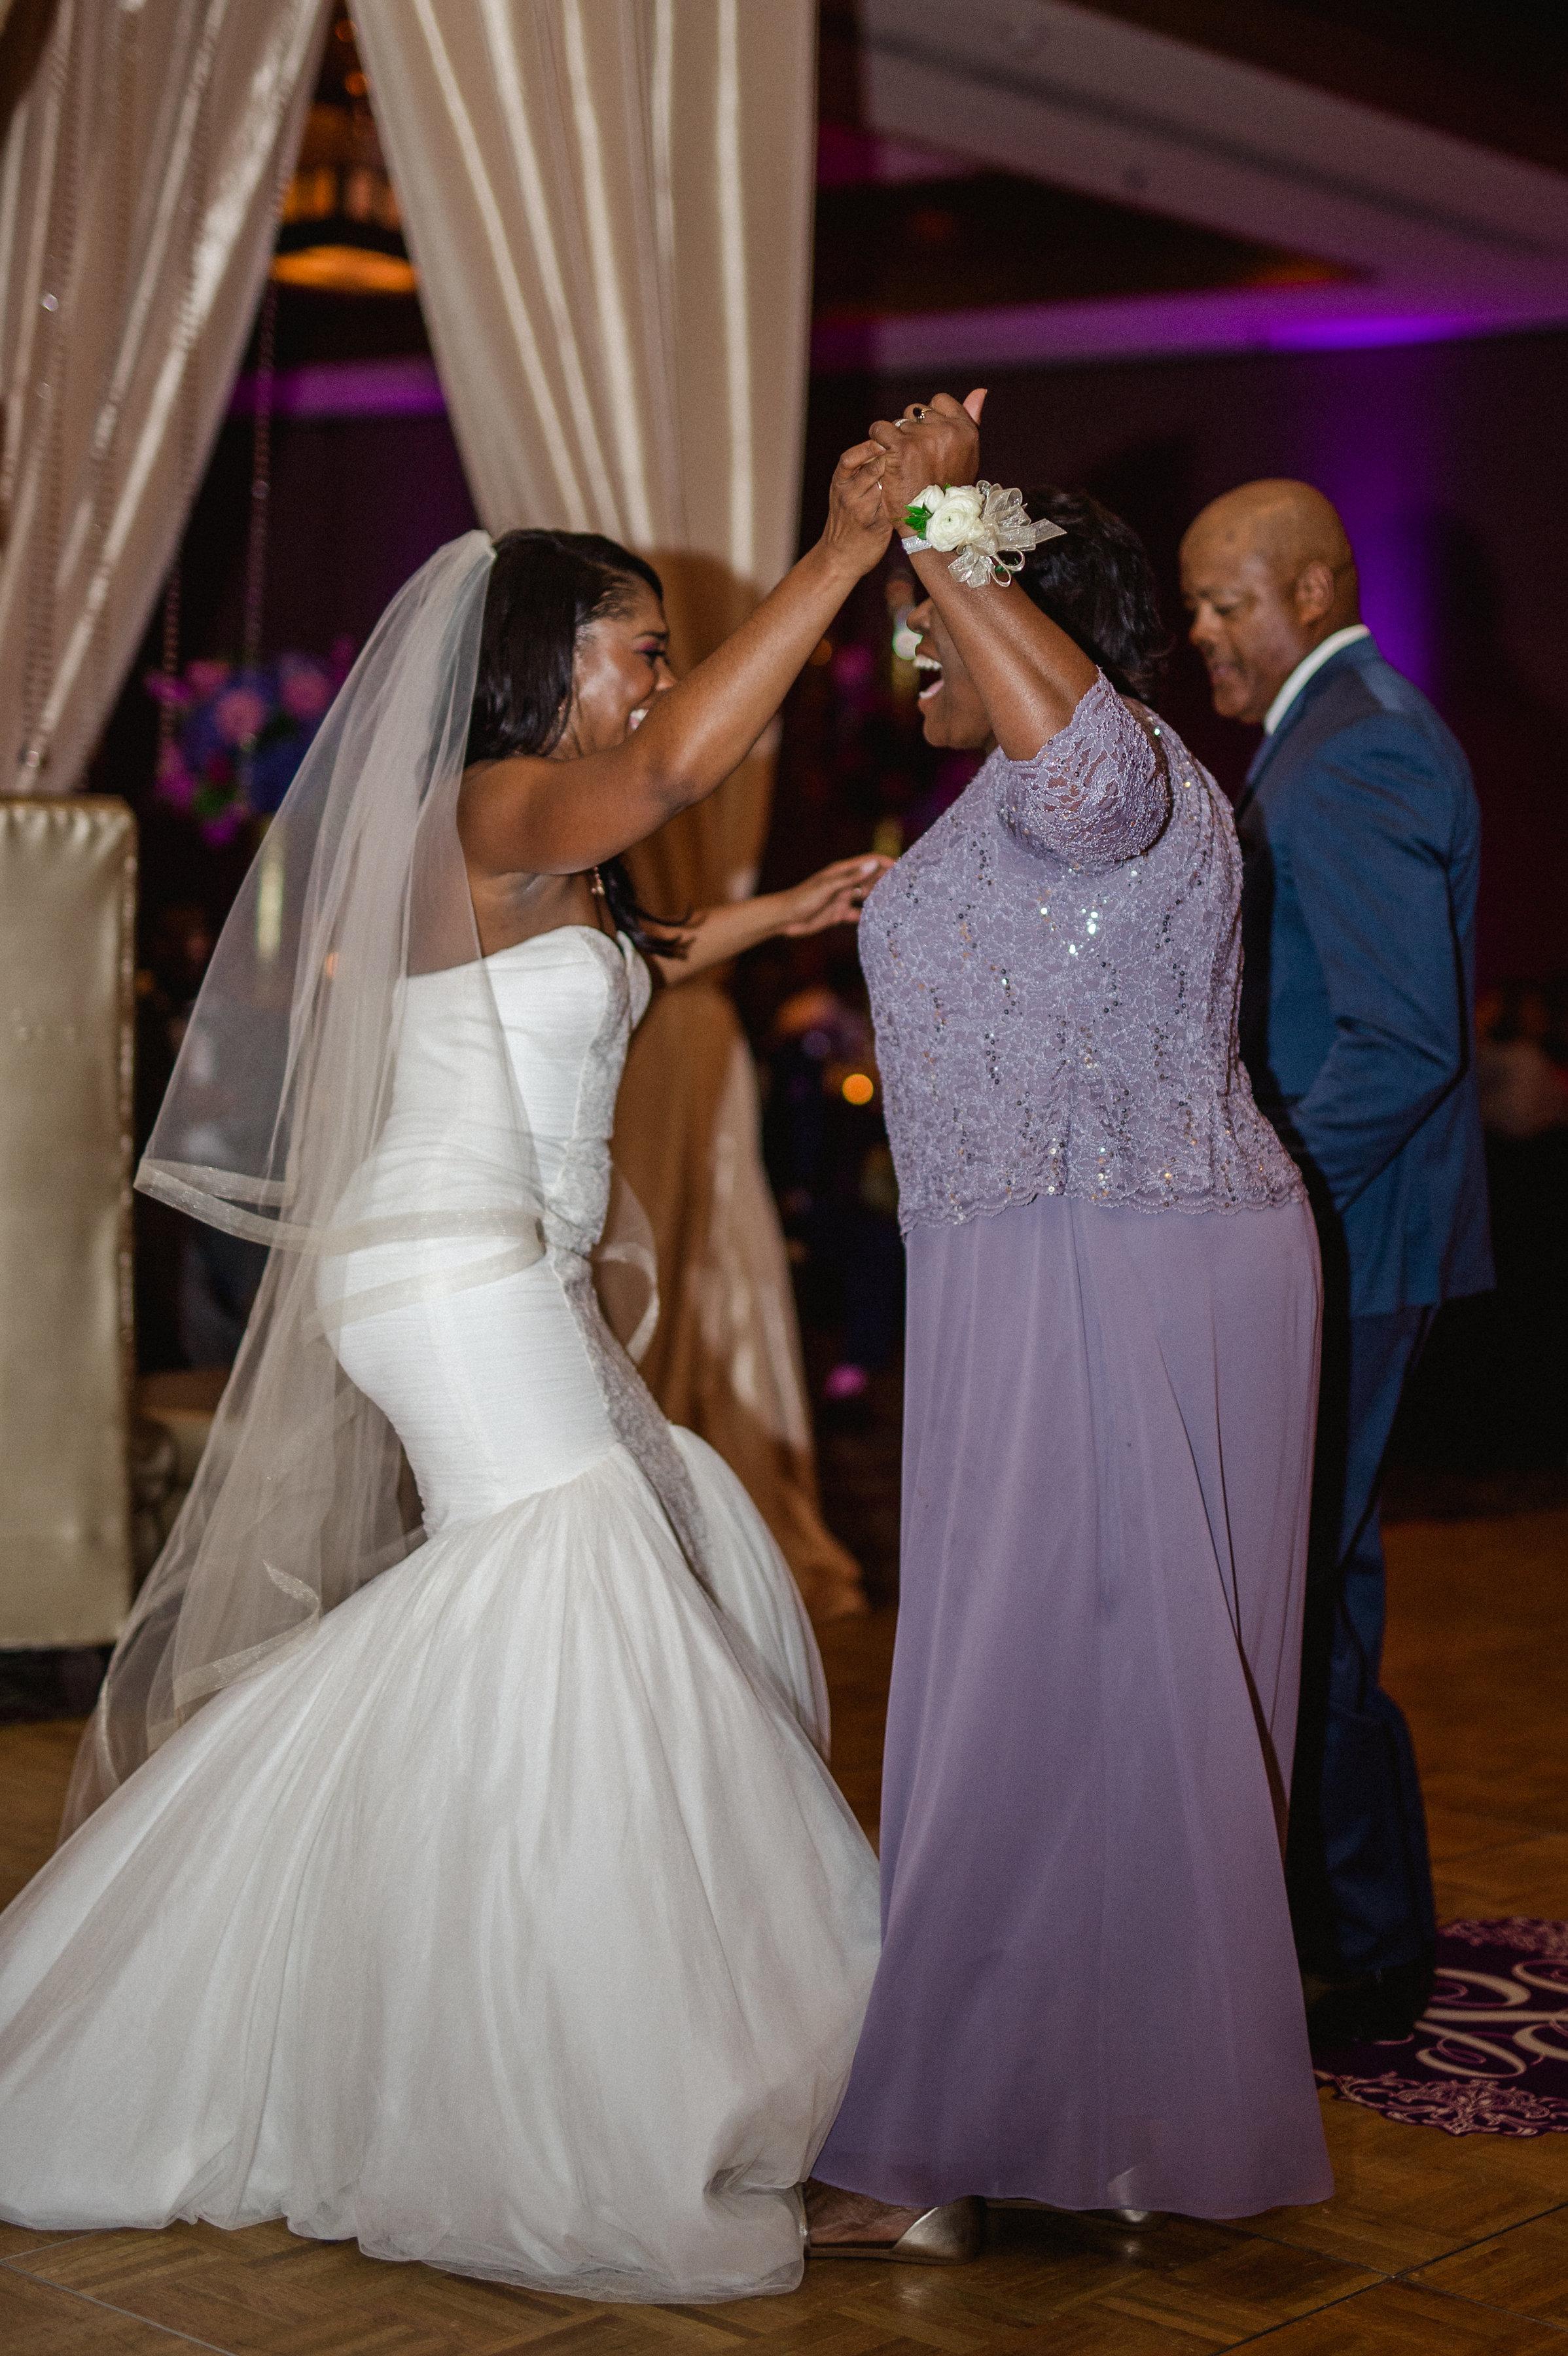 imani&chris|wedding|reception-175.jpg